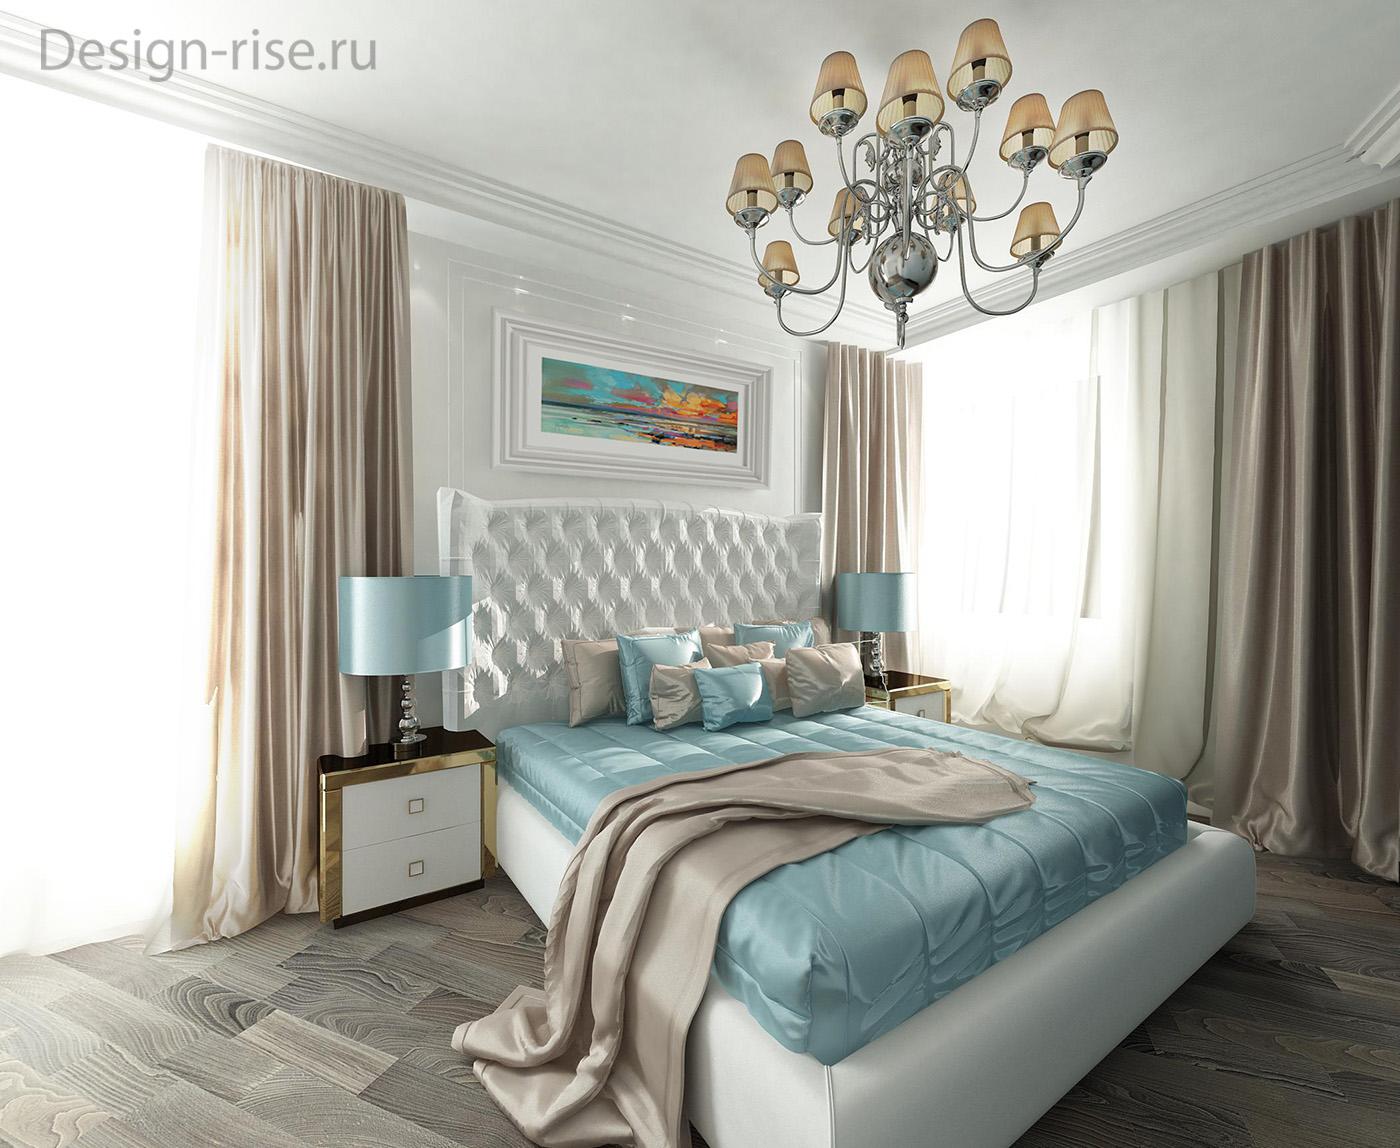 Krasivie_kvartiri_spalnya_30